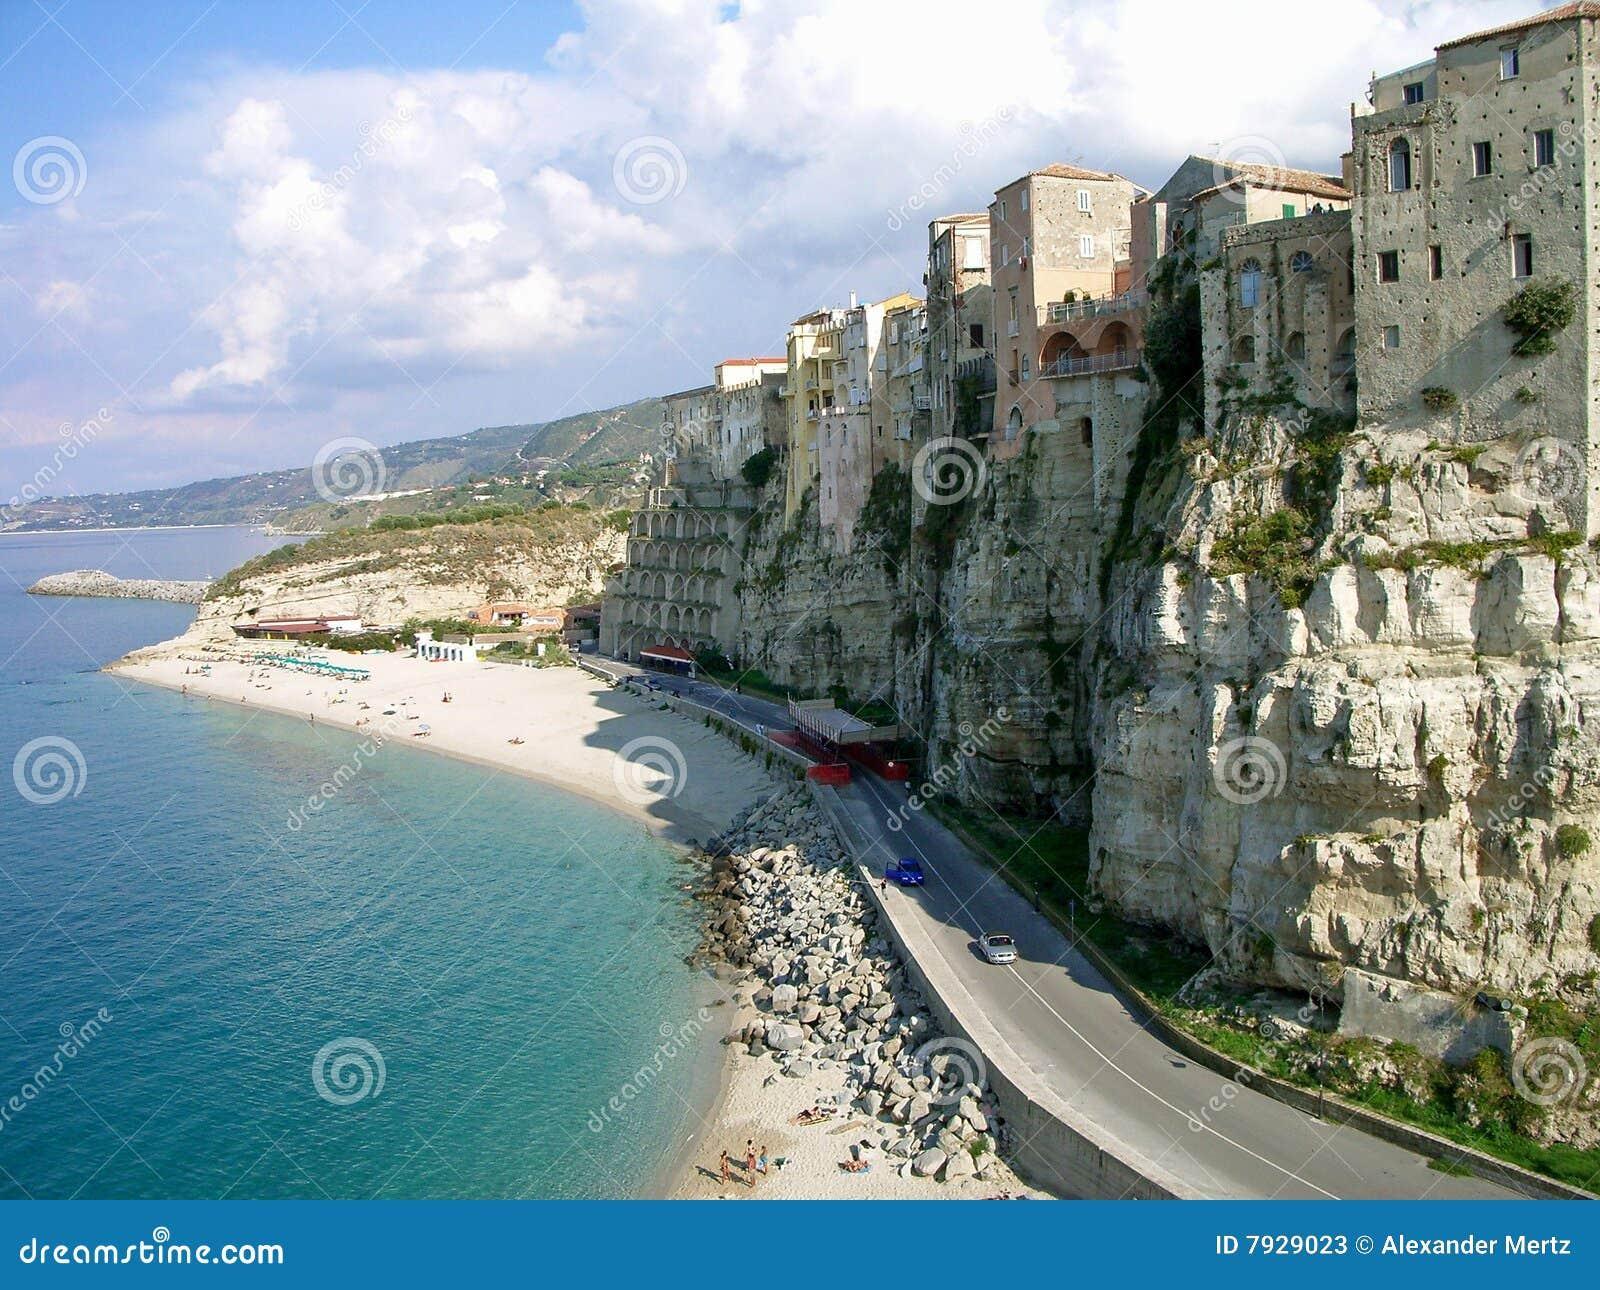 Steep coast in Calabria, Italy